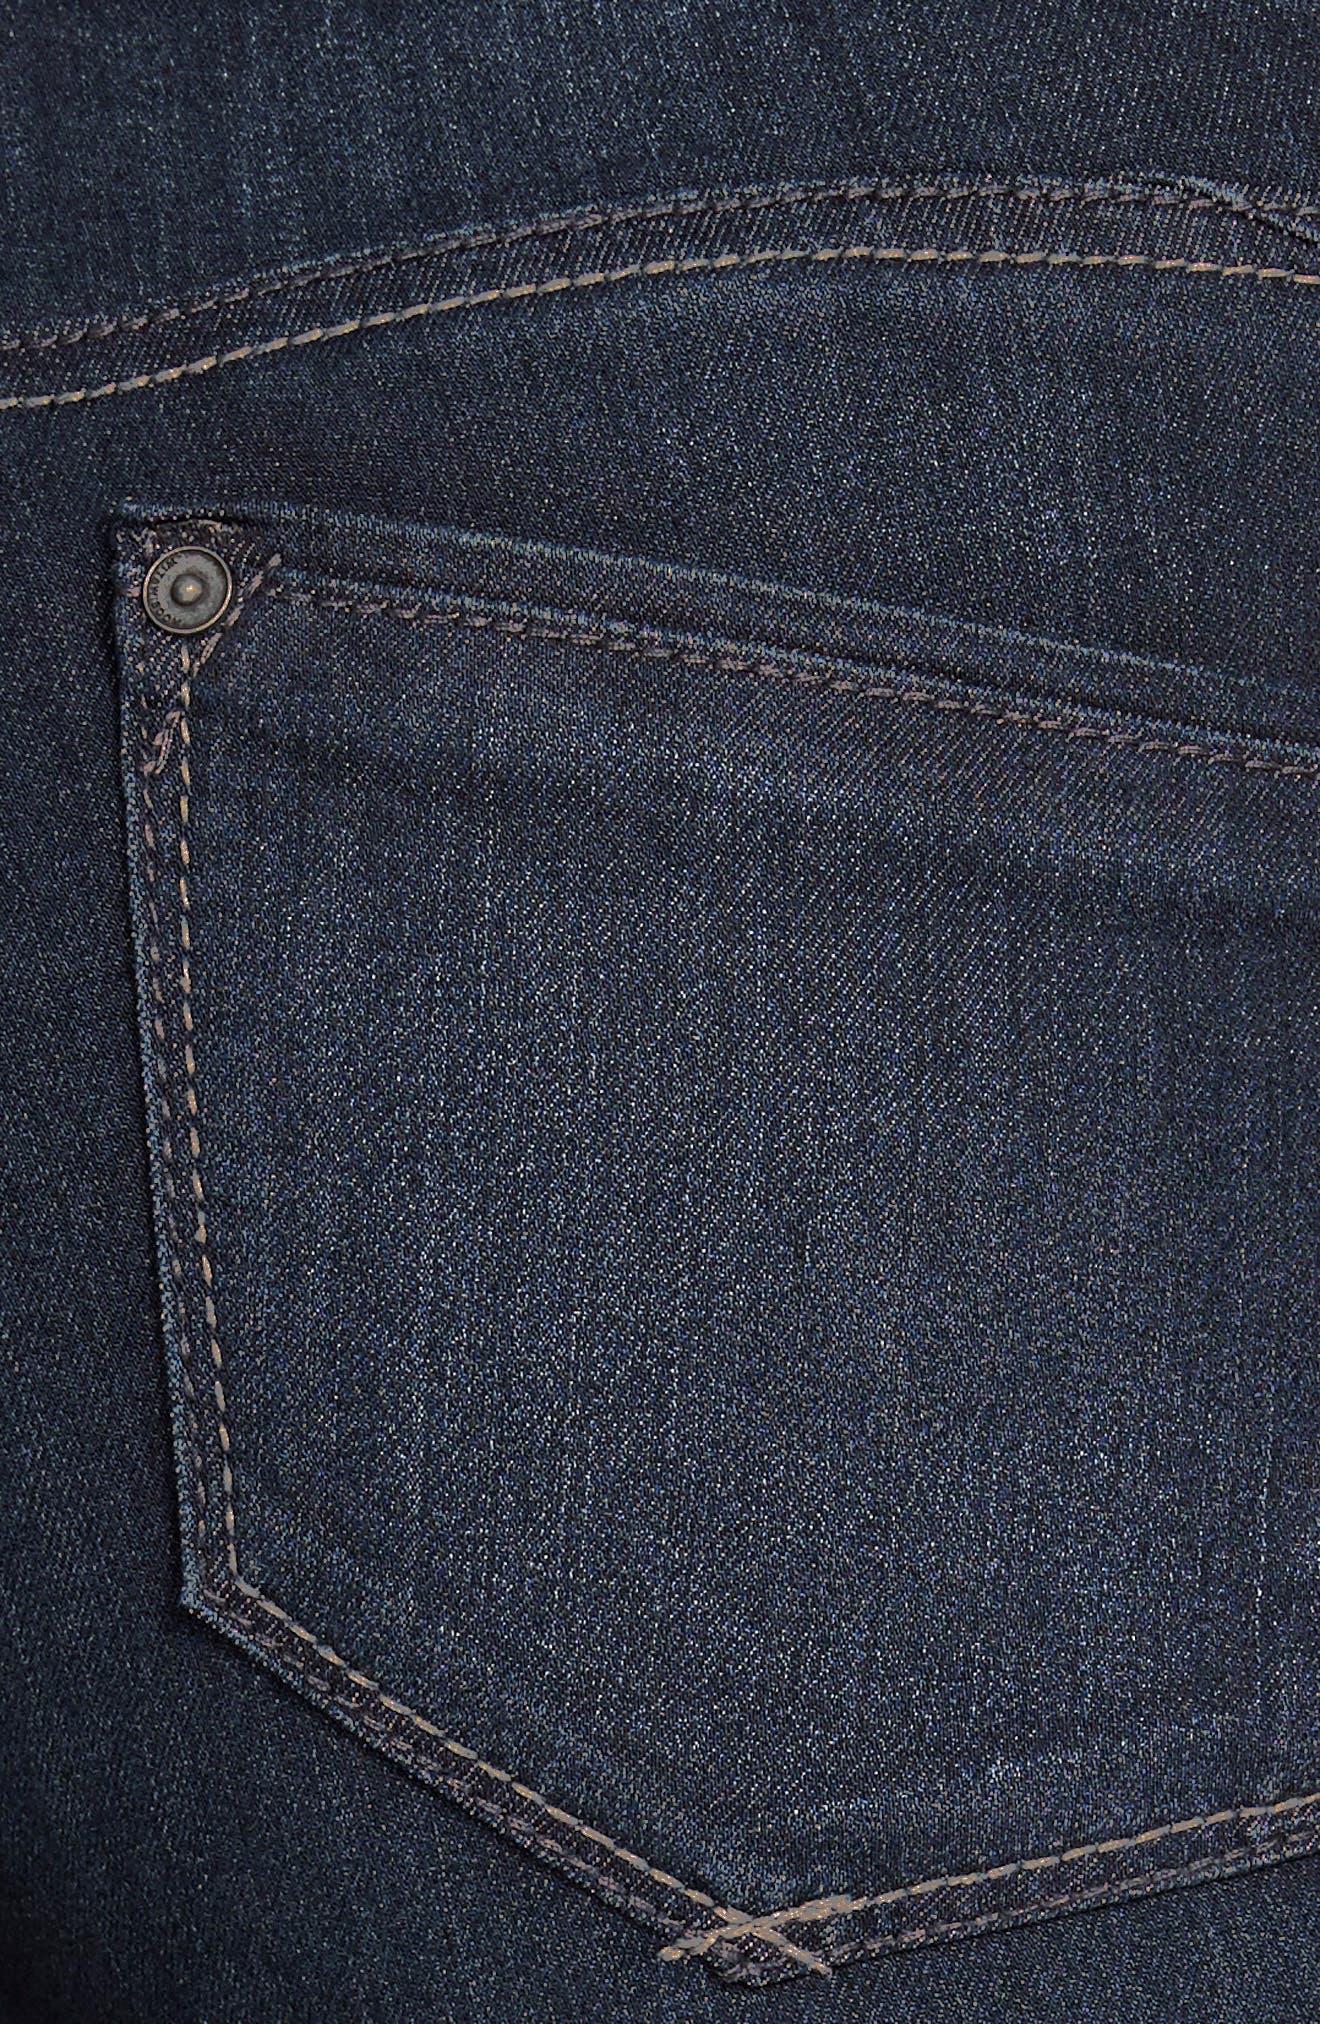 WIT & WISDOM, Super Smooth Stretch Denim Skinny Jeans, Alternate thumbnail 4, color, DARK NAVY